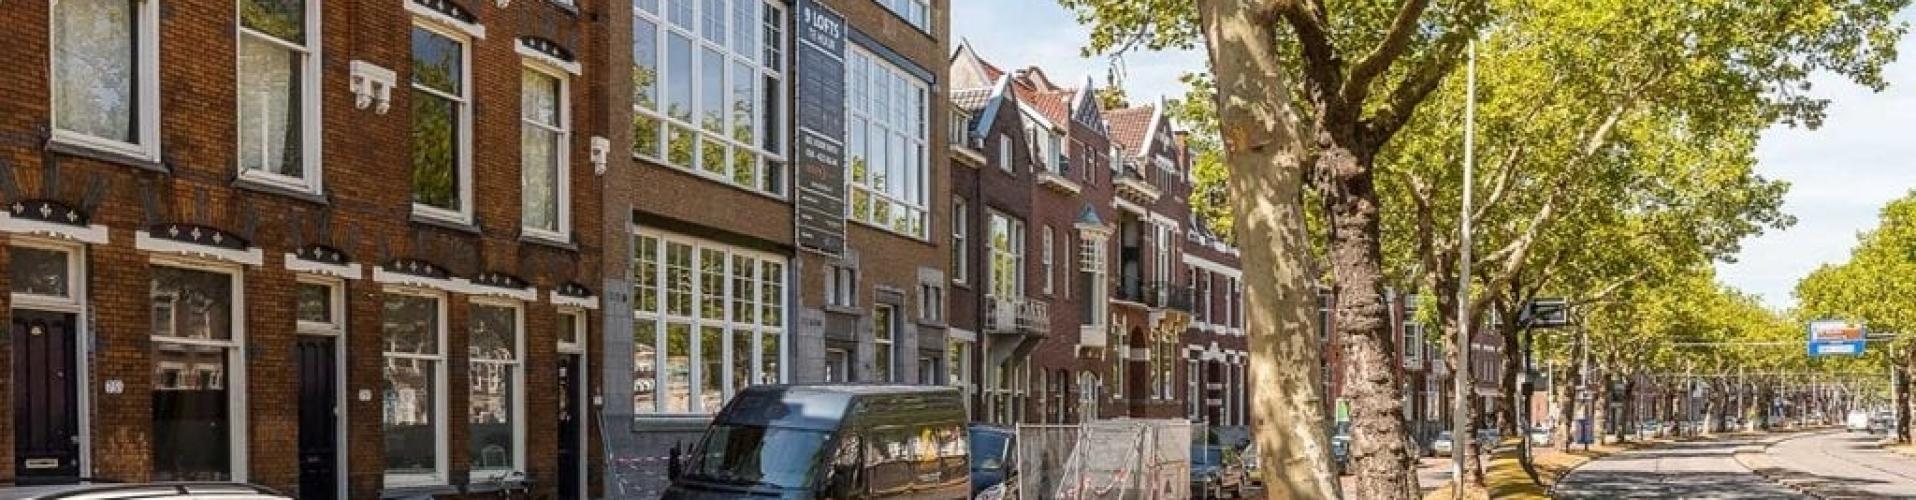 annexum-owf-open-woningfonds-rotterdam-gravendijkwal-73-001-1260x690-1-1024x561